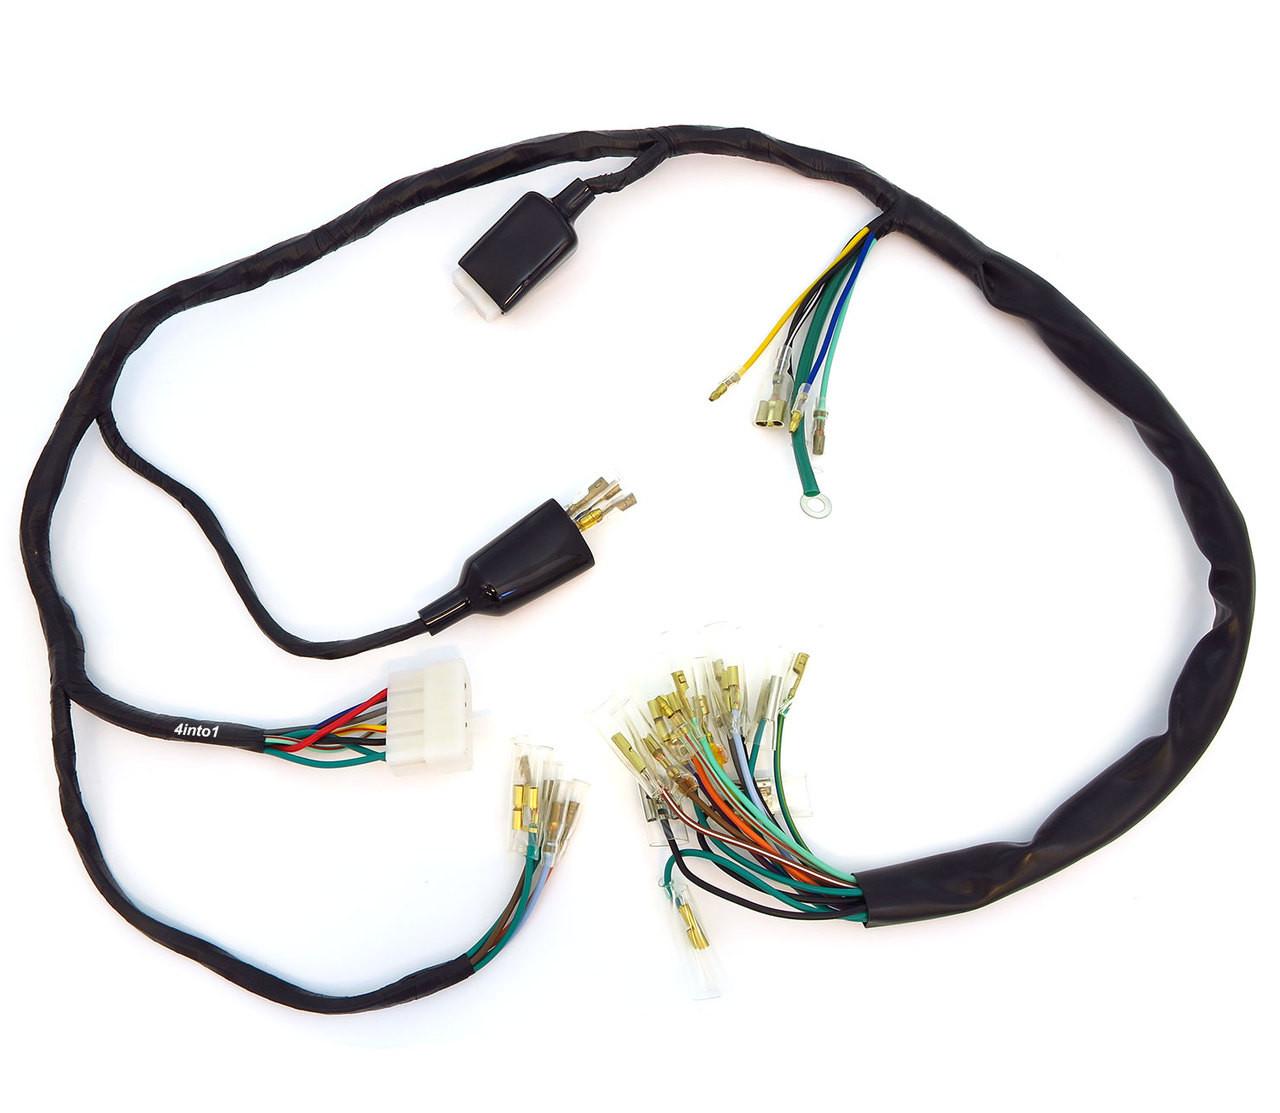 phoenix wiring harness wiring database library wire harness ustp data wiring diagram schema motorcycle wiring harness phoenix wiring harness